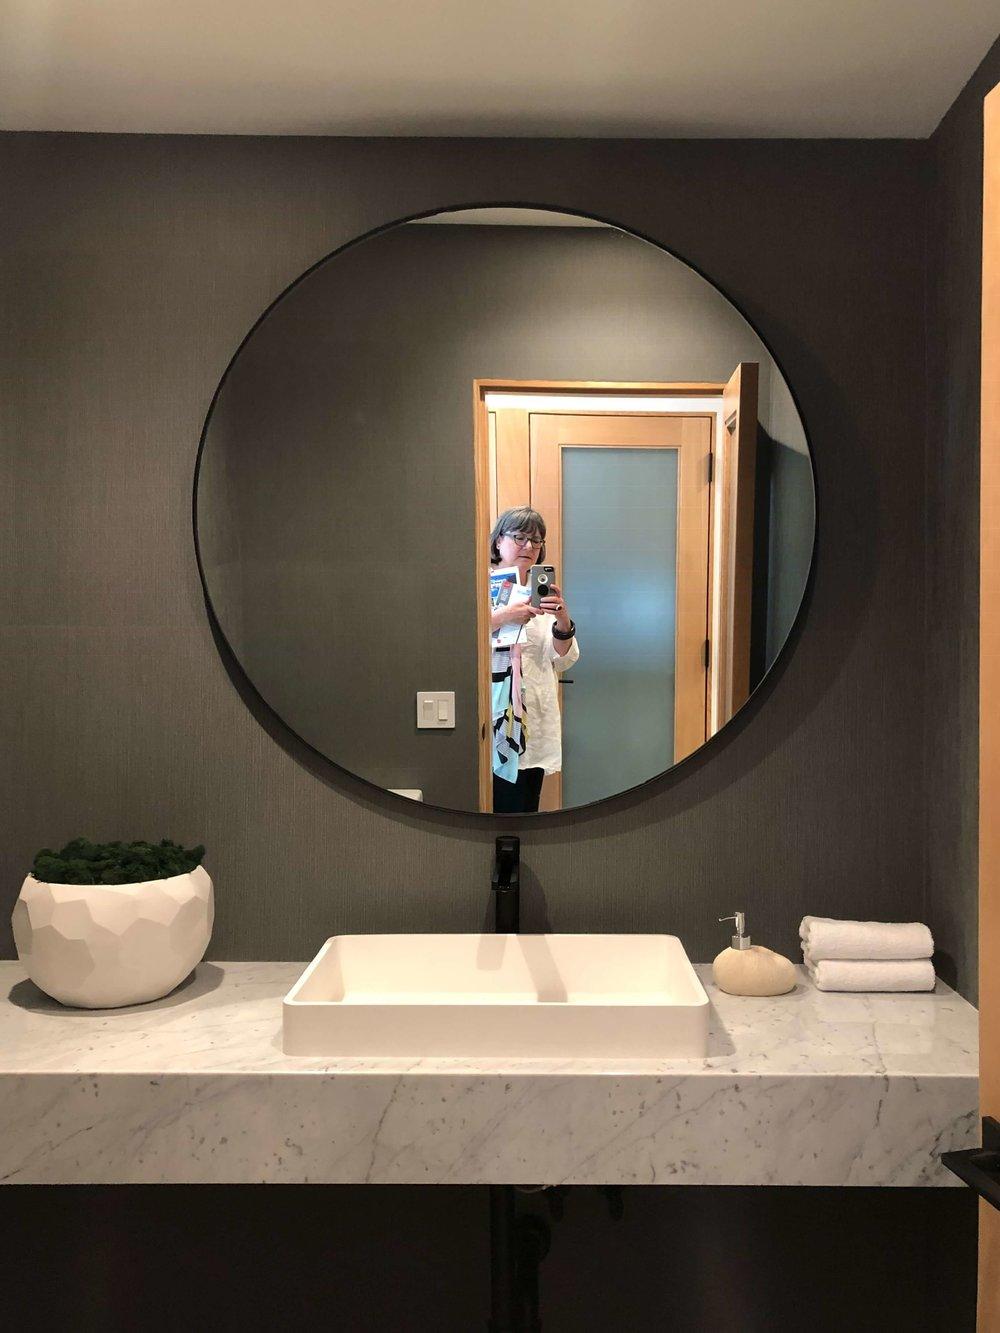 Powder room in California contemporary home, Dwell on Design's Fall Home Tour, Designer: Vitus Matare #powderroom #powderbath #marblevanity